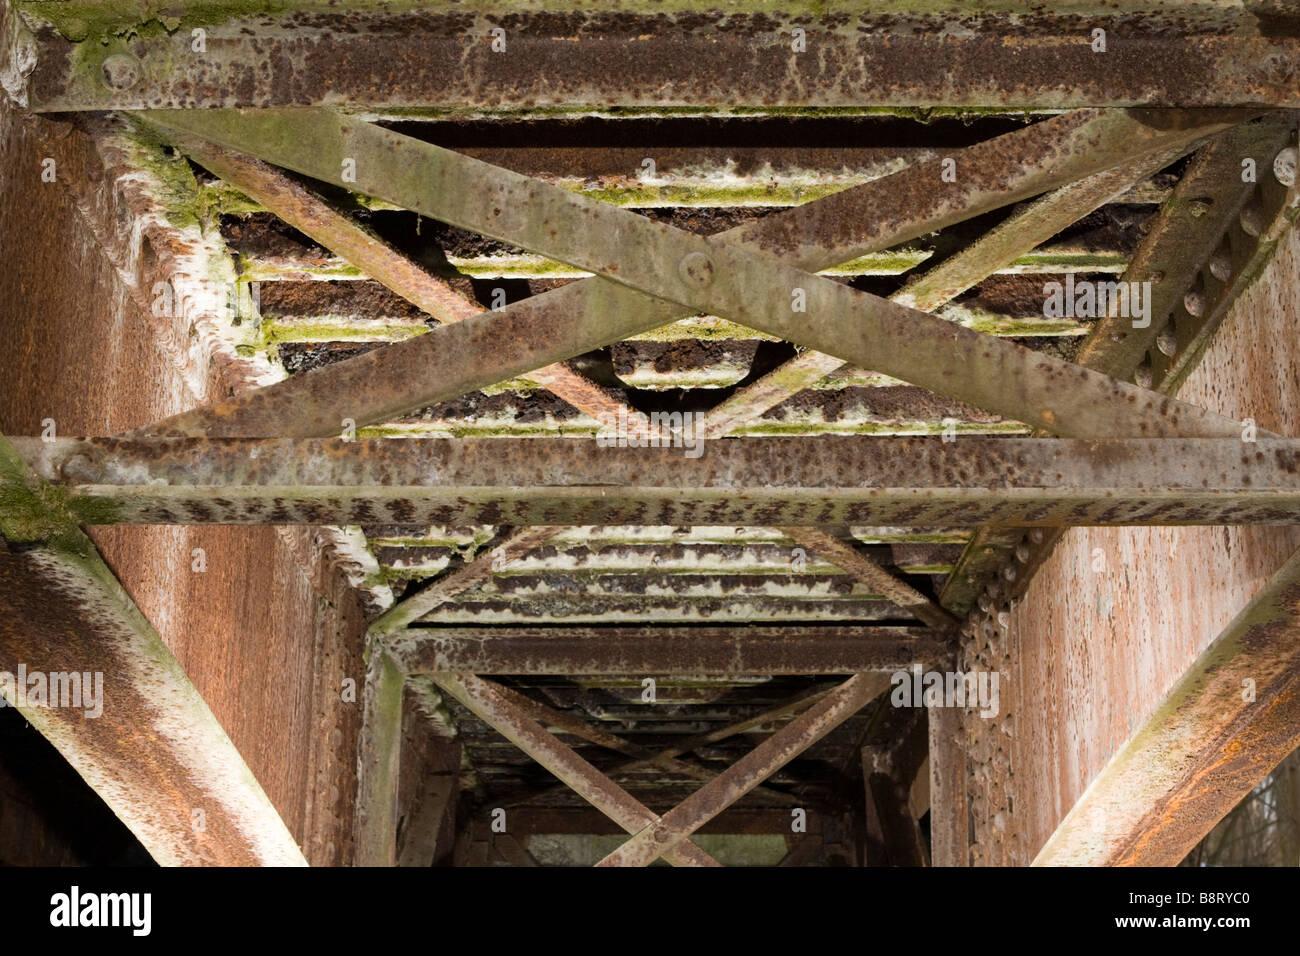 Latticed Rusted Metal Beams Forming Old Bridge Decking